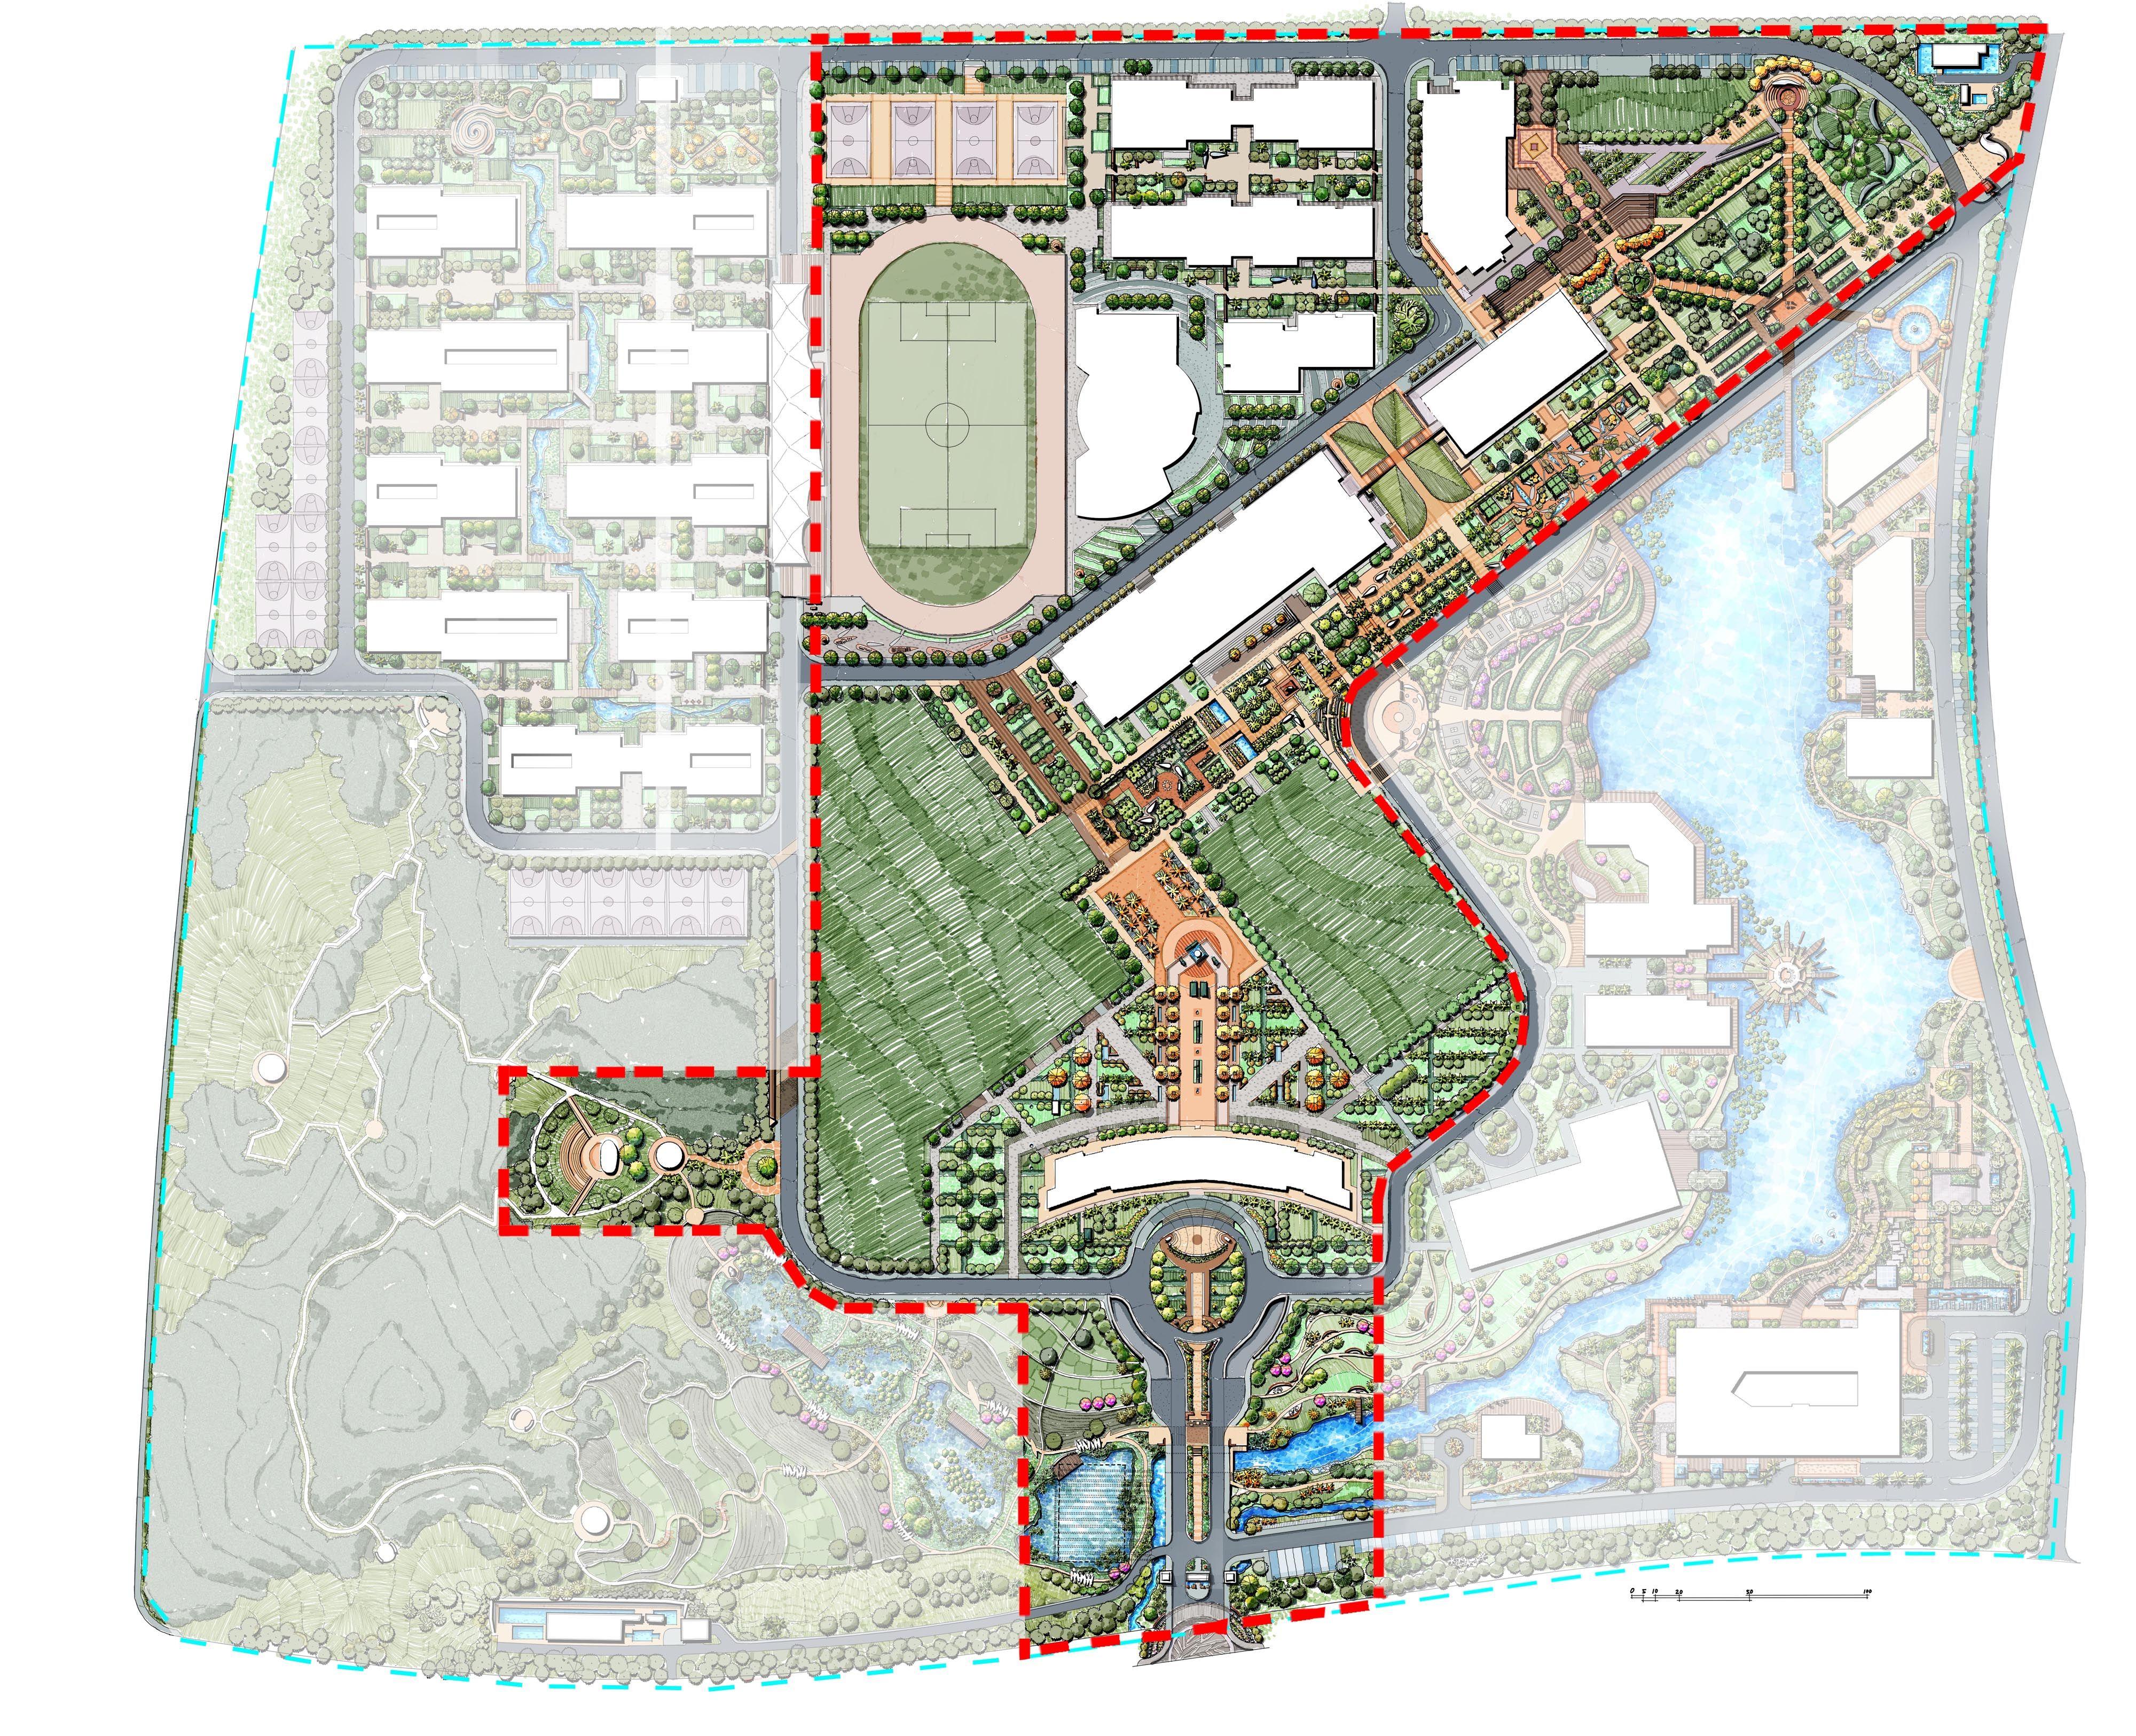 Nanjing Tech University Landscape Master Plan Master Plan Landscape Architecture Design Landscape